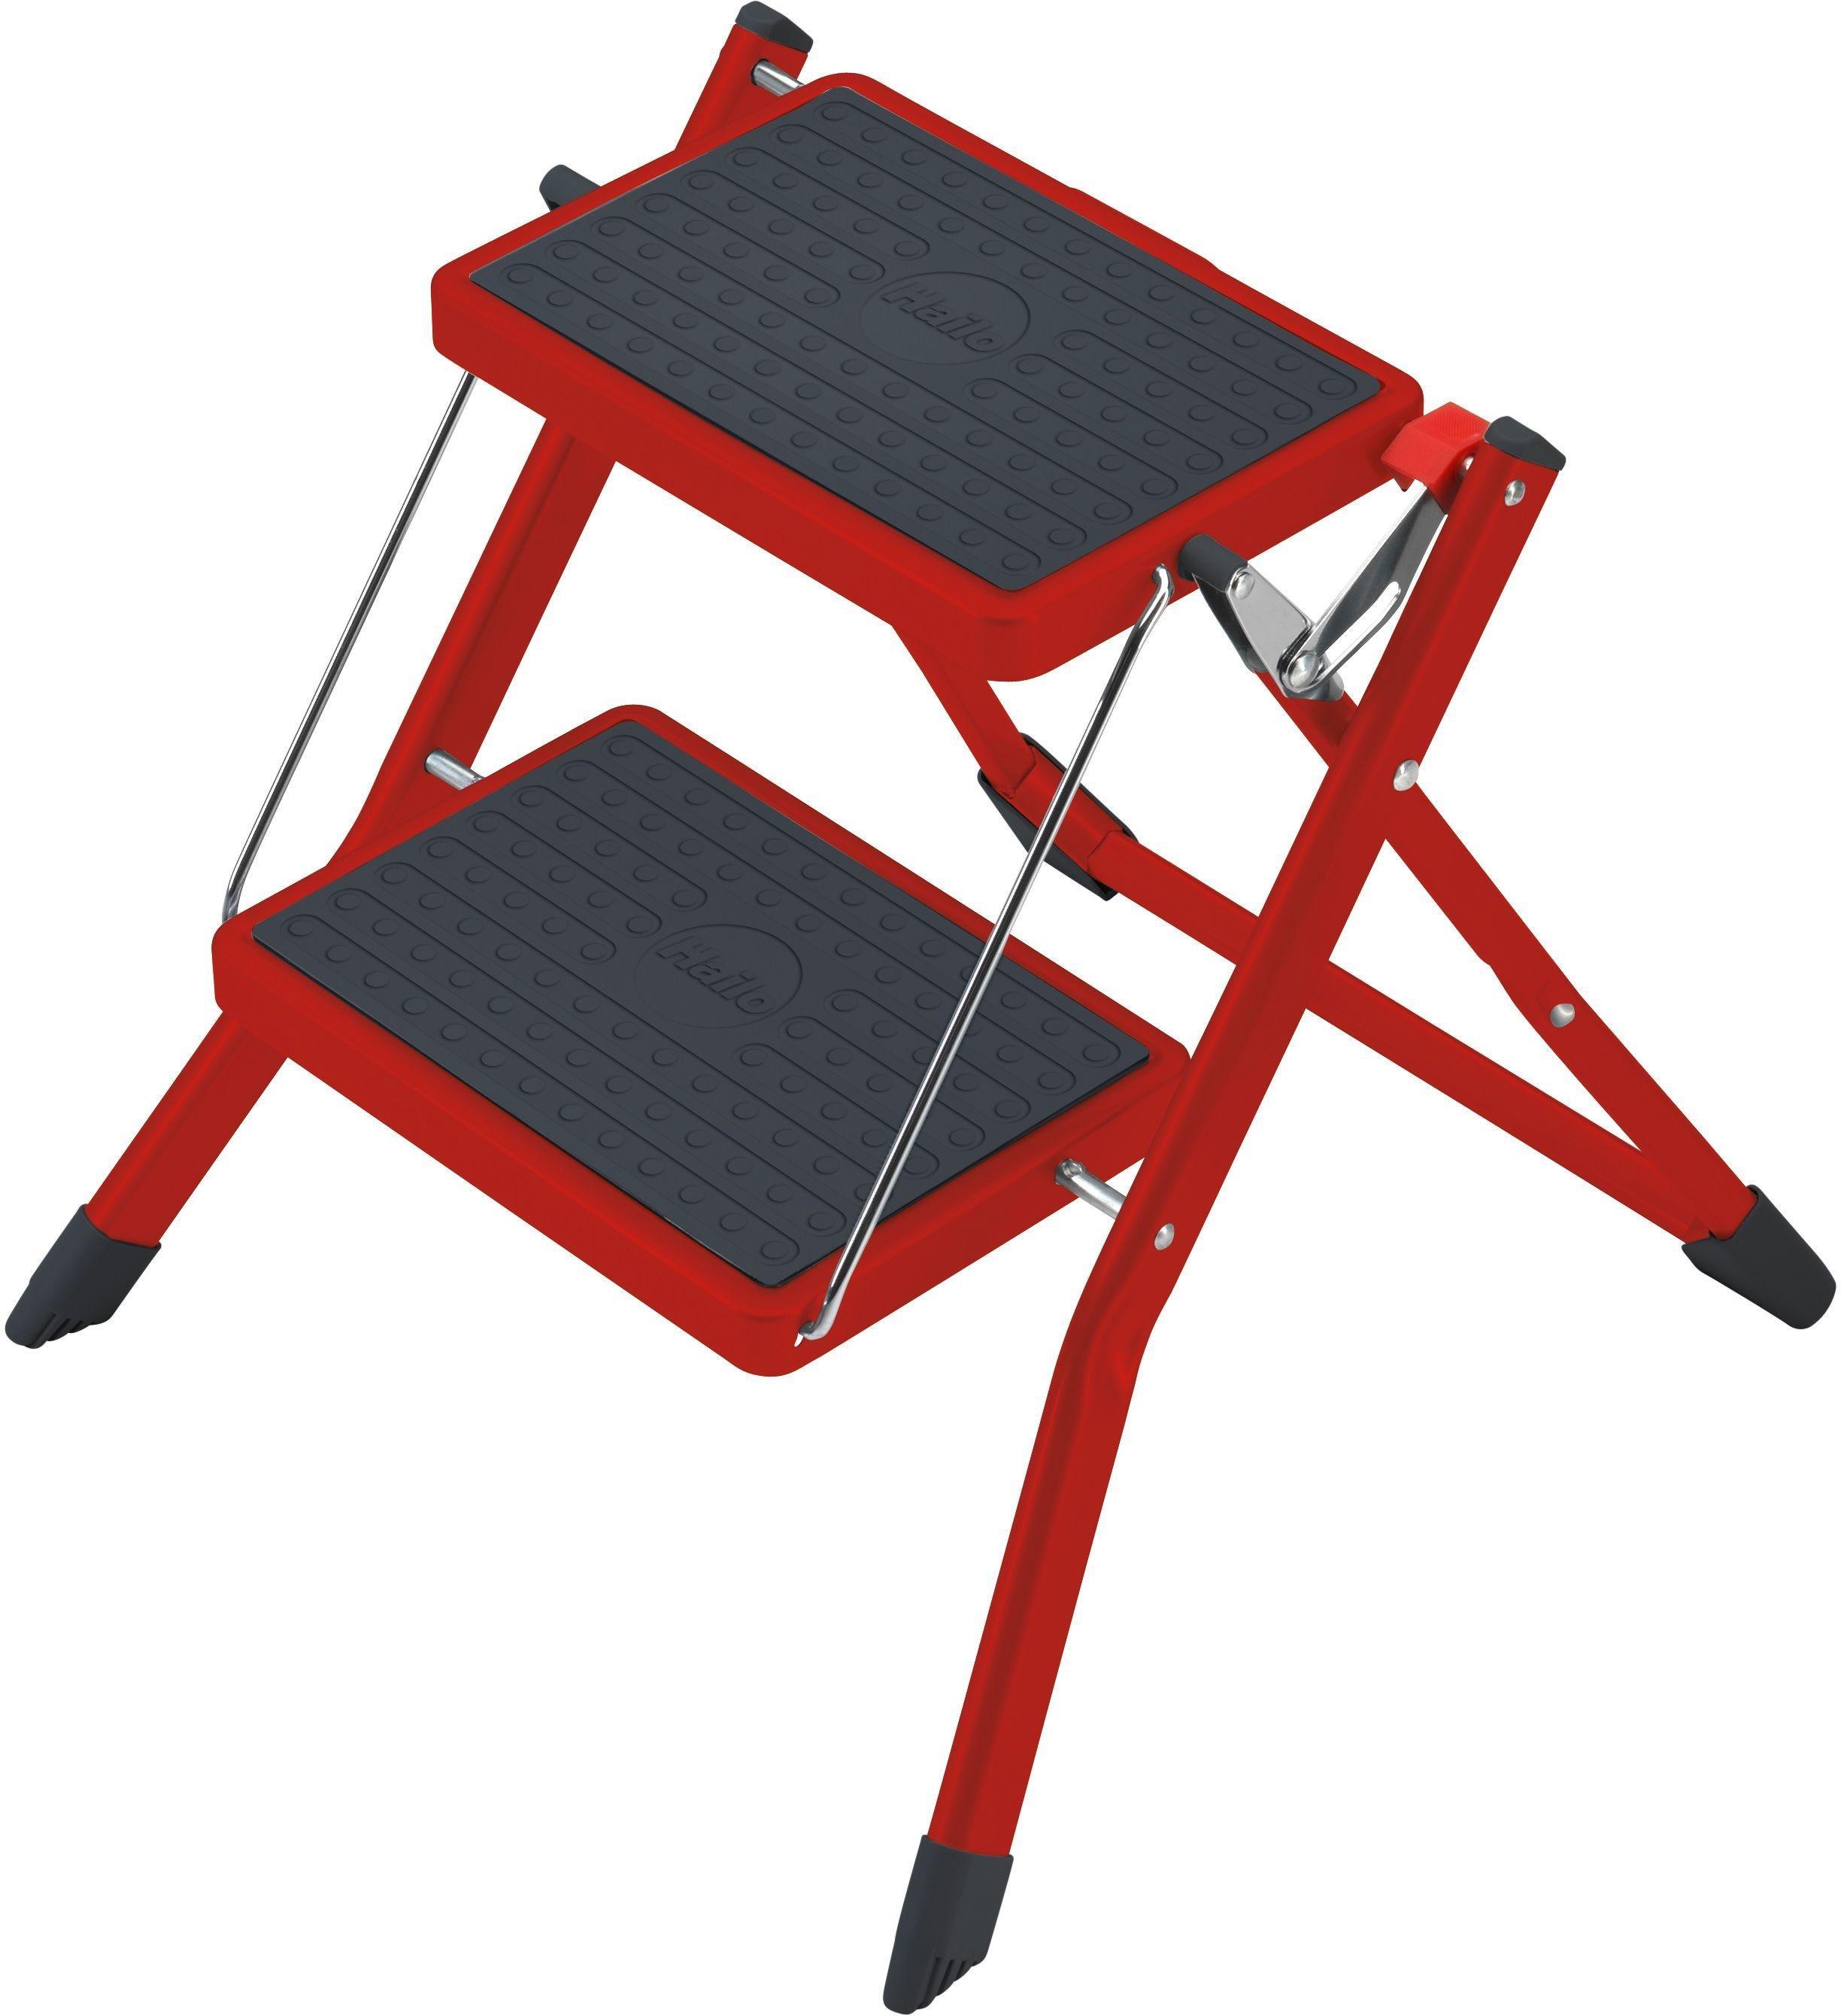 Hailo Mini K Step Stool - Red lowest price